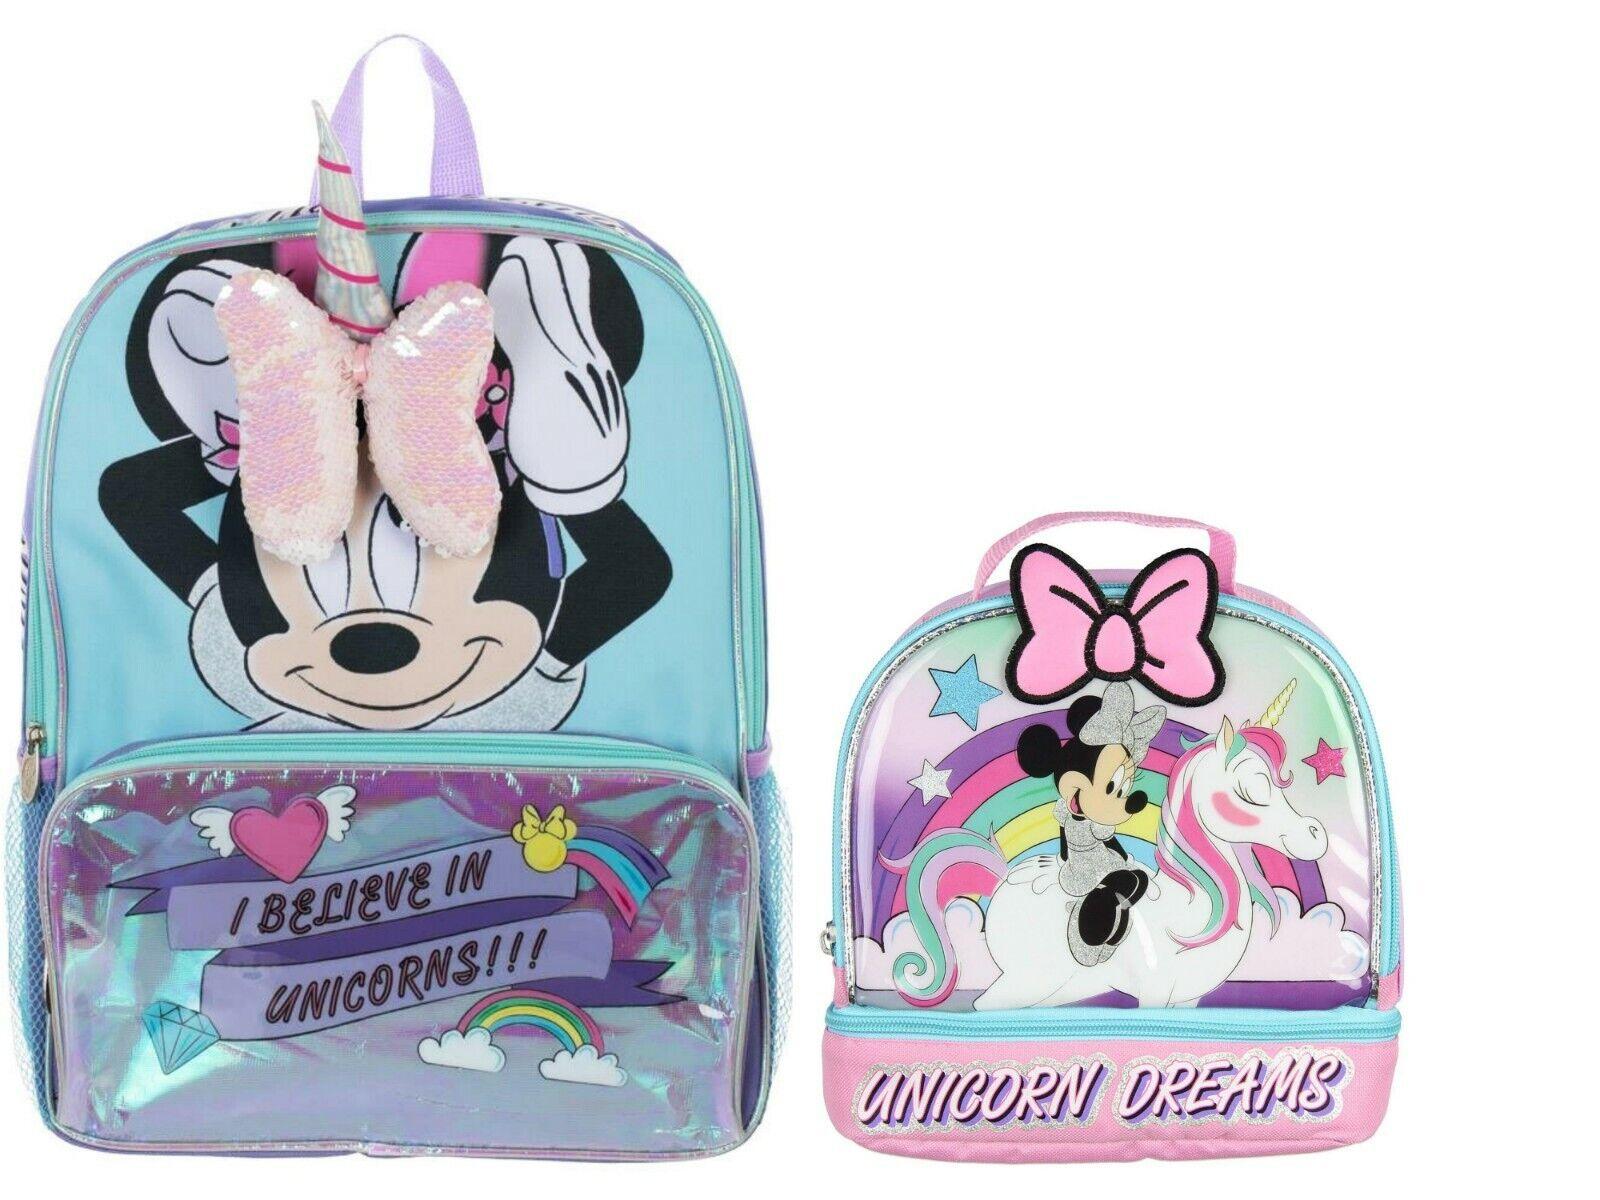 Disney Minnie Mouse Unicorn Girls School Backpack Lunch box